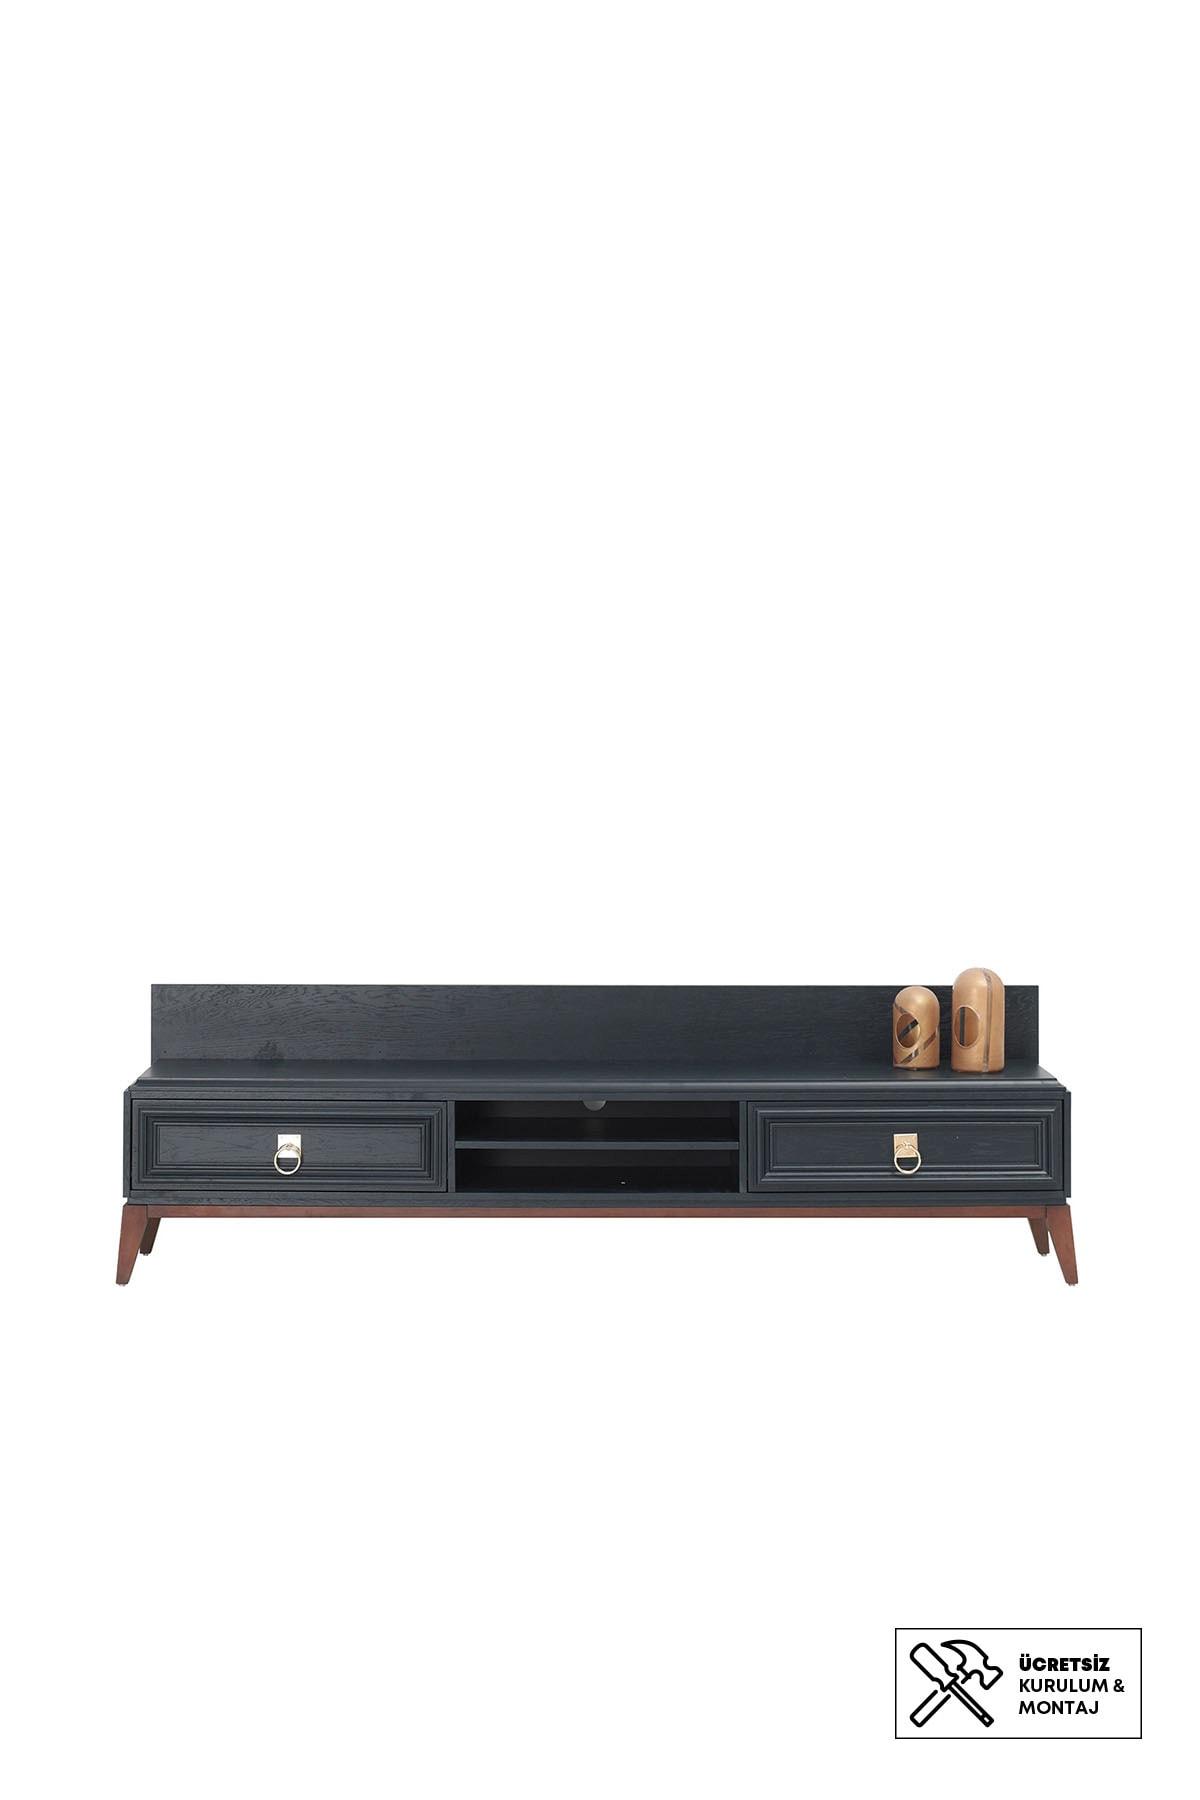 Enza Home Elegante Tv Sehpası (73X240X47 Cm)